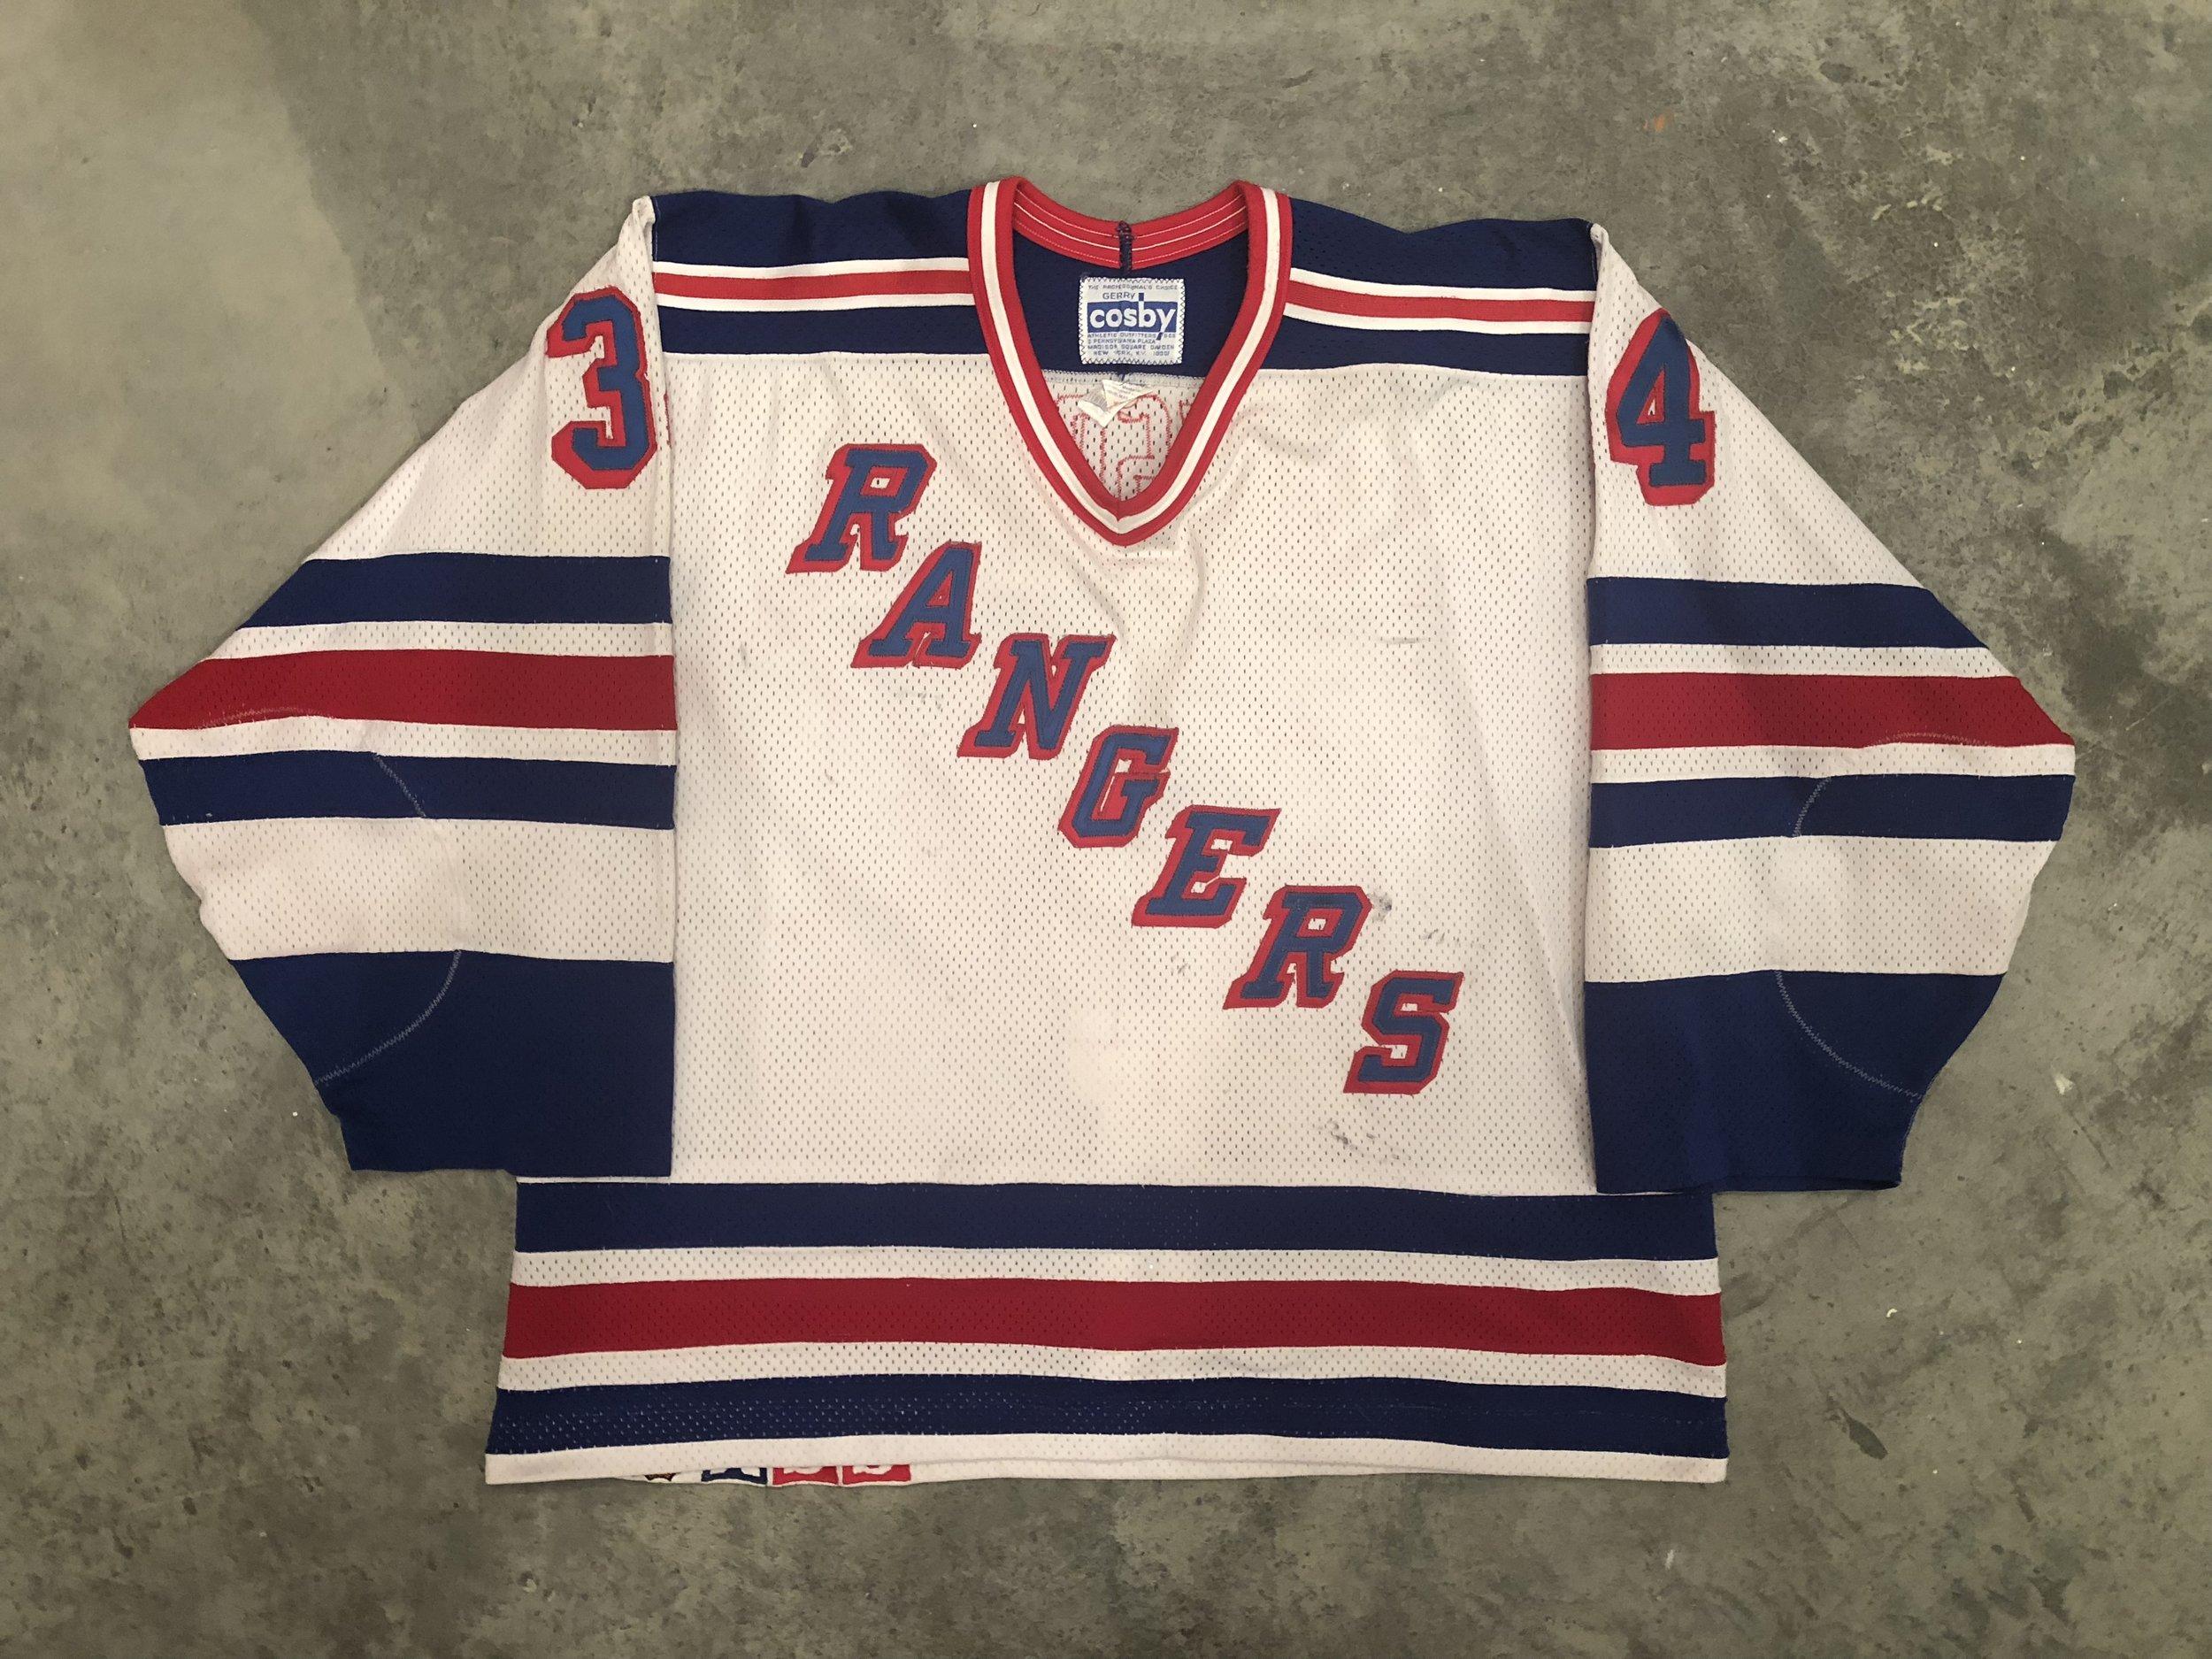 1990-91 New York Rangers game worn home jersey